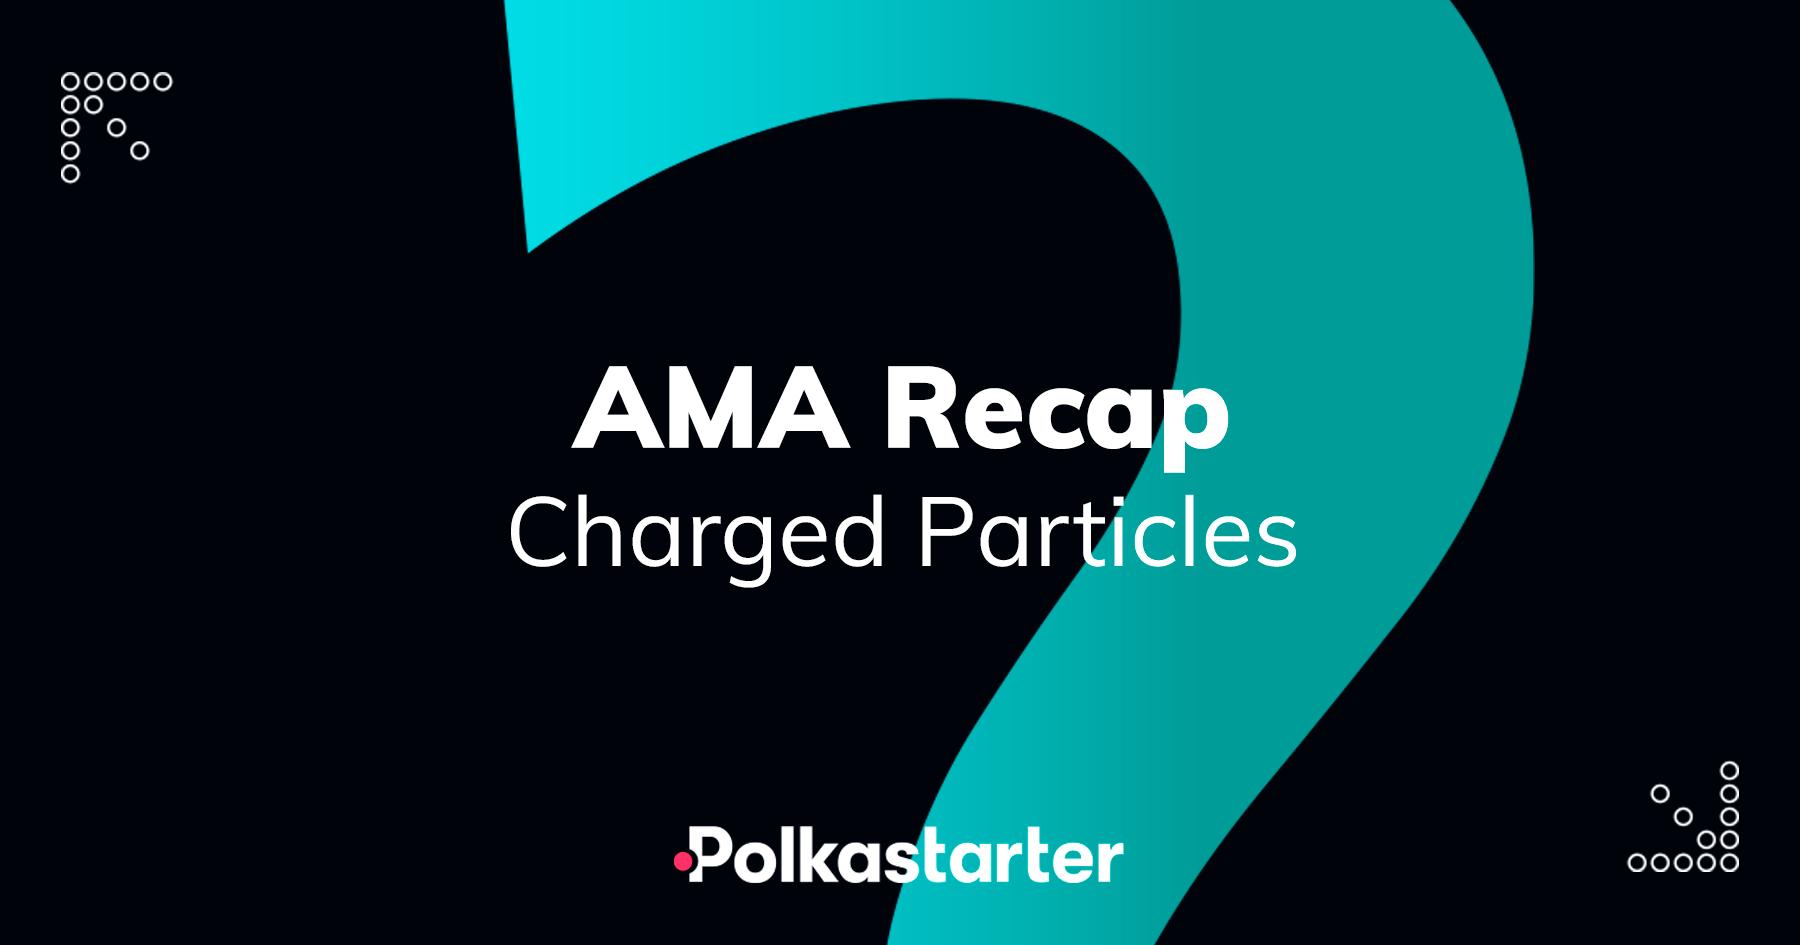 [PolkaStarter] Polkastarter and Charged Particles AMA Recap - AZCoin News